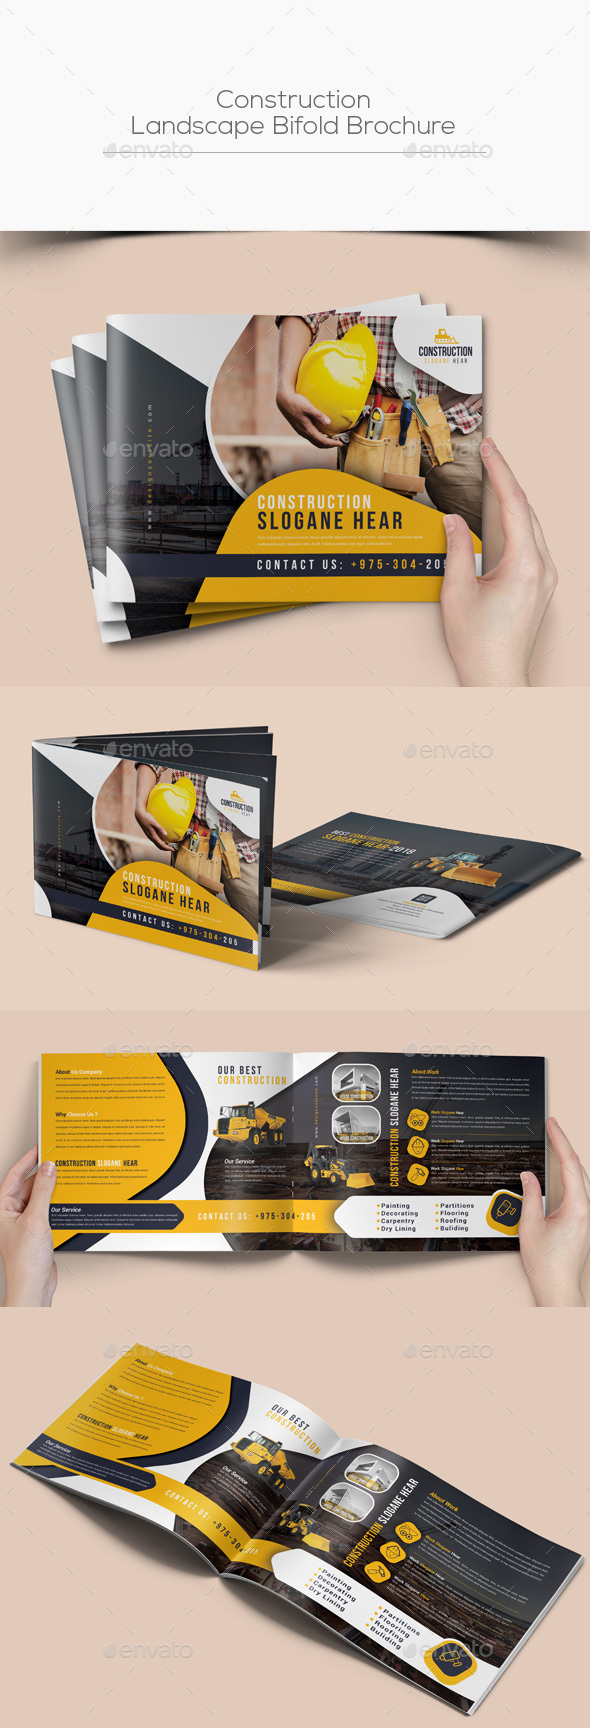 Construction Landscape Bifold Brochure - Corporate Brochures